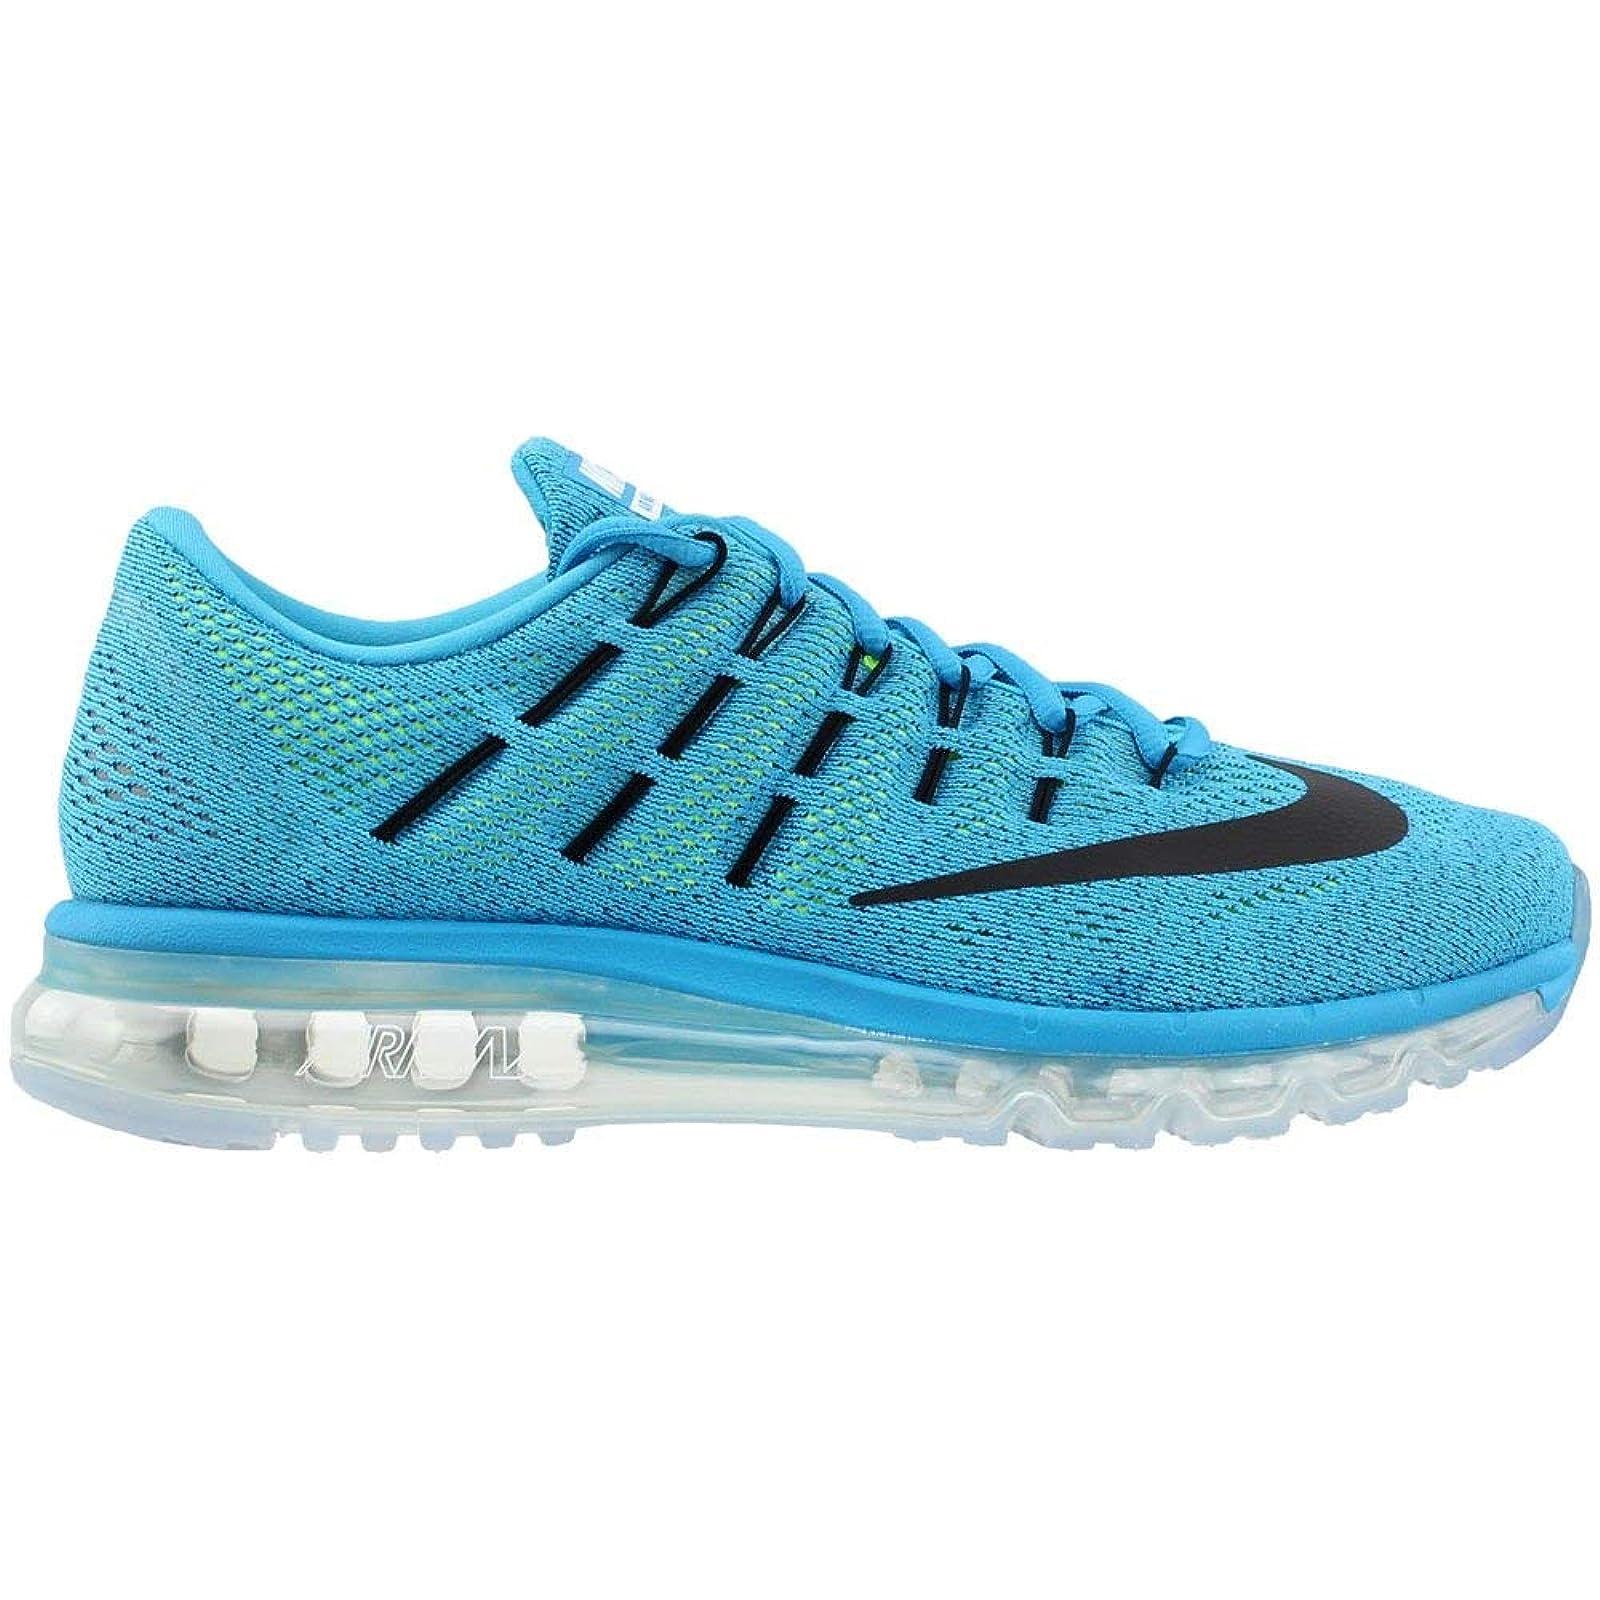 Nike Men's Air Max 2016 Running Shoe 8 M US - 1